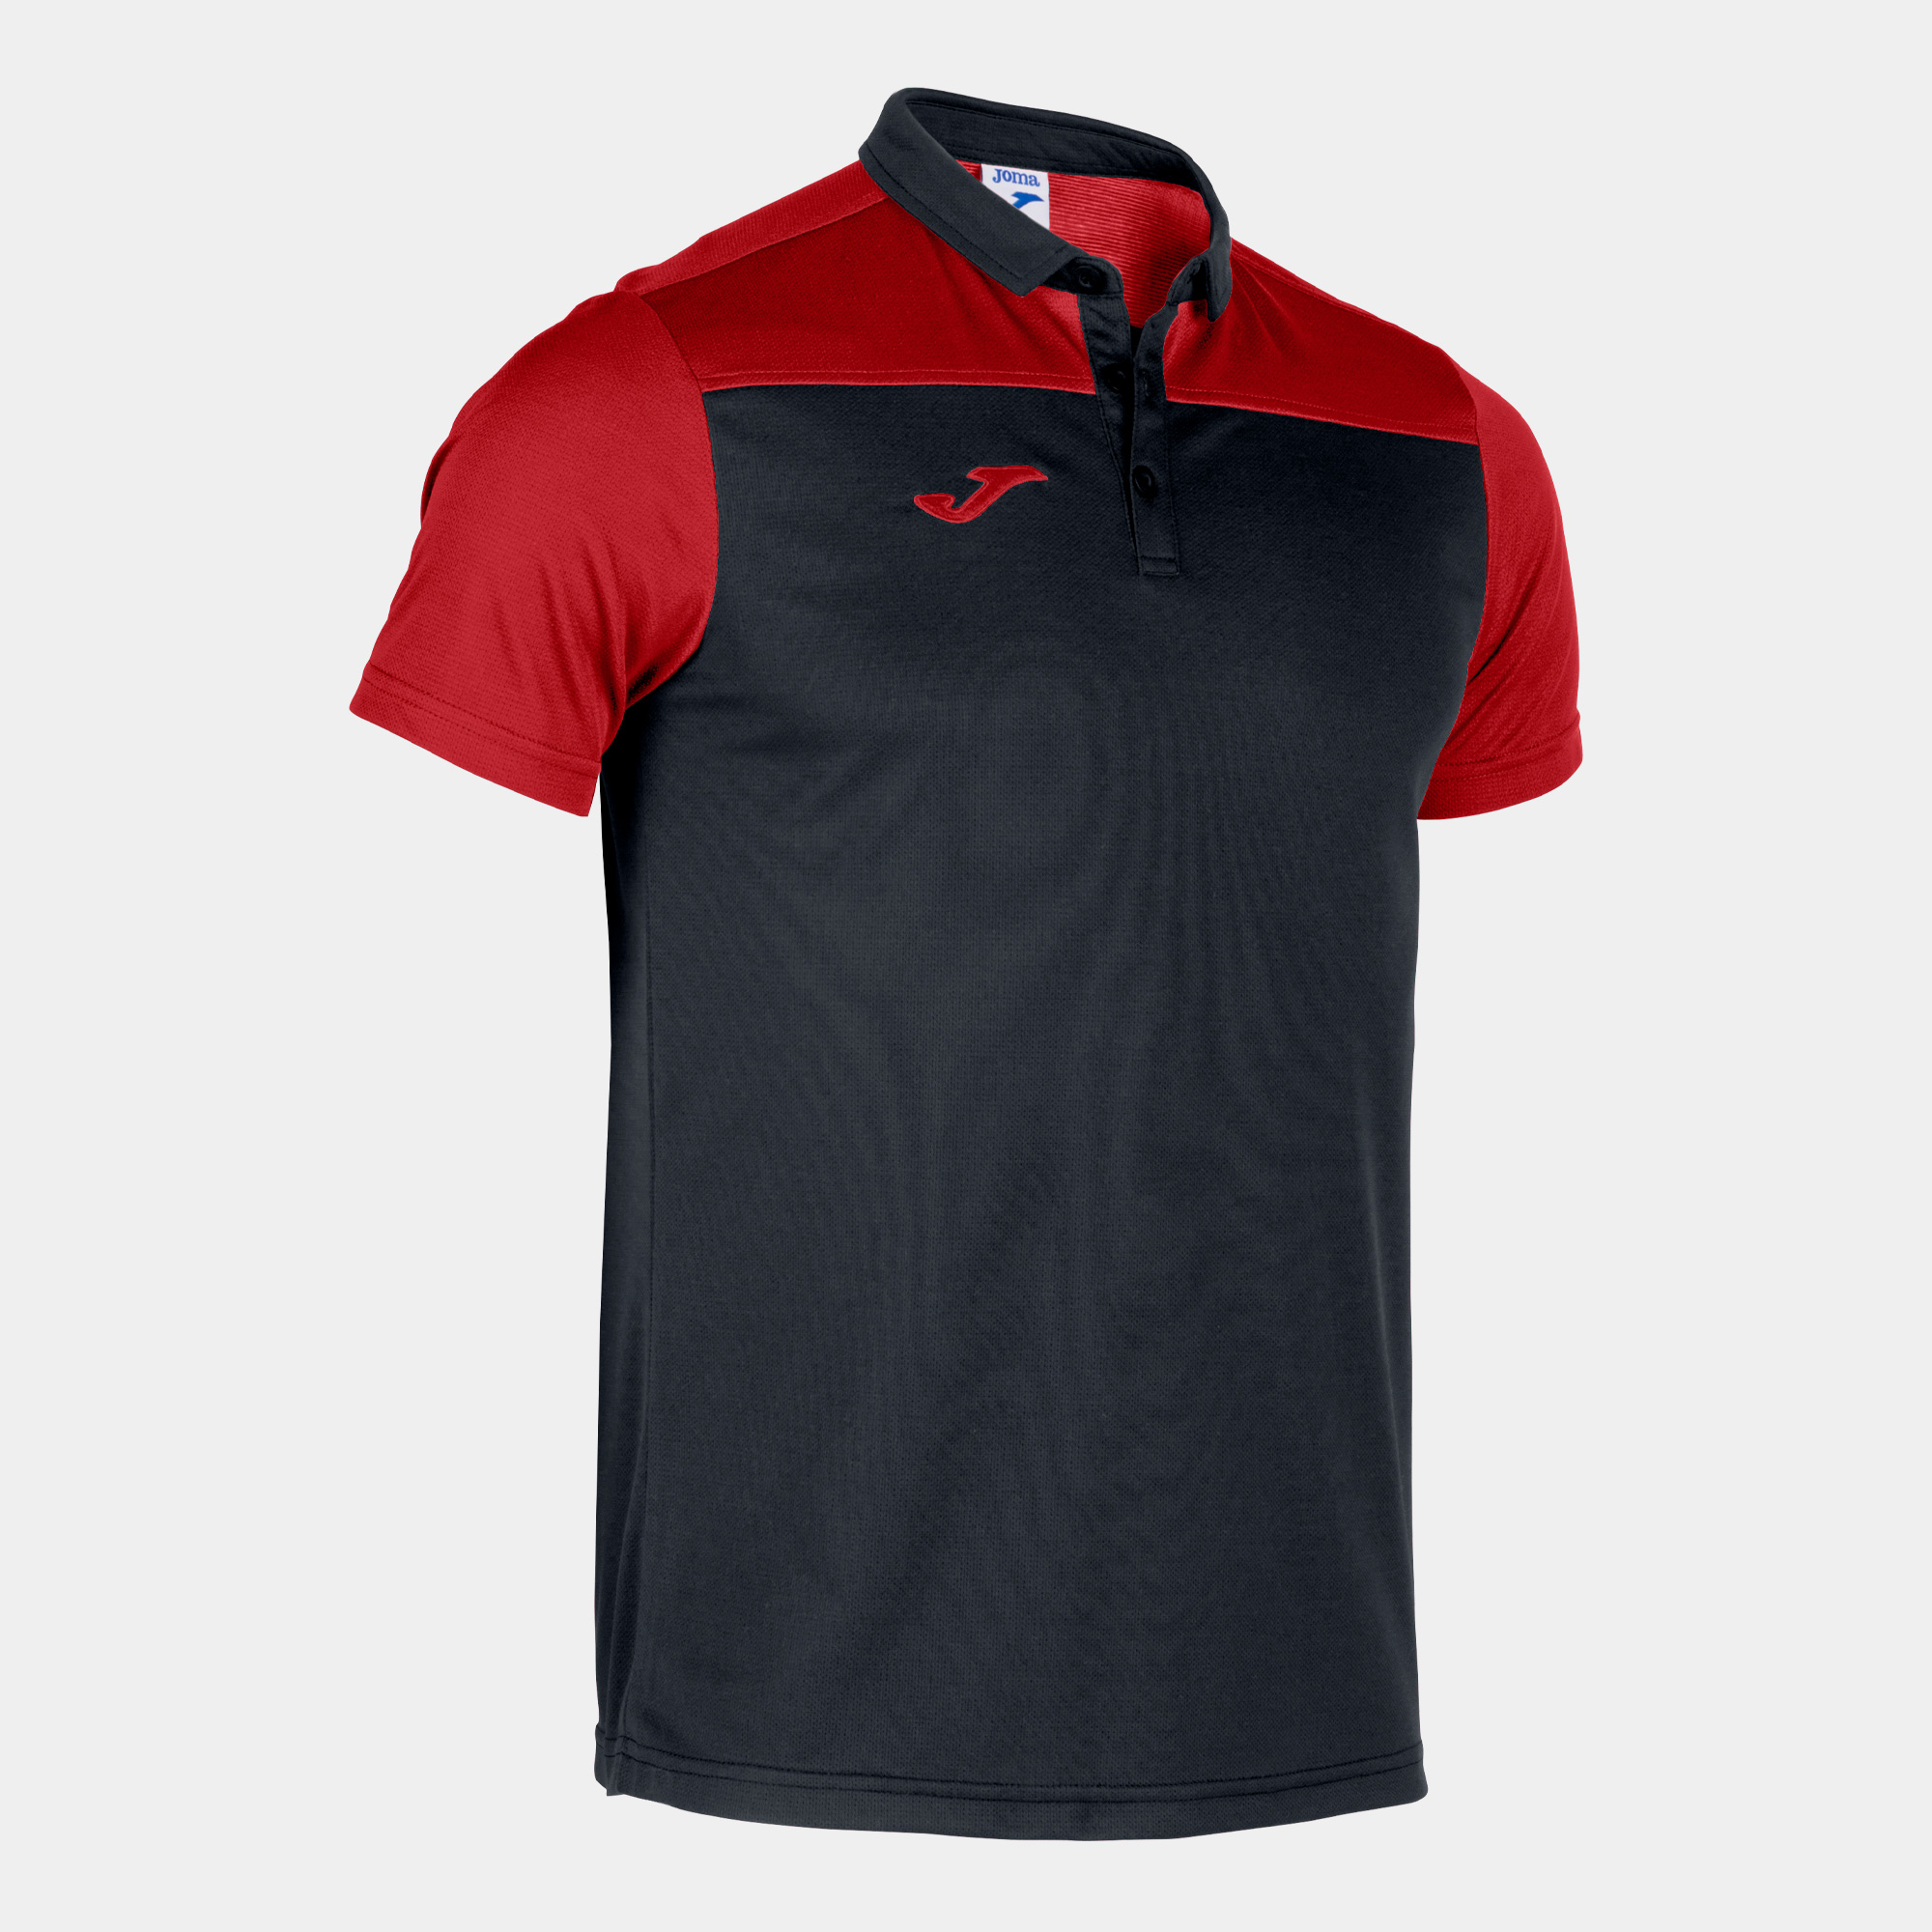 4195dd321 Joma Crew III Polo Shirt - Euro Soccer